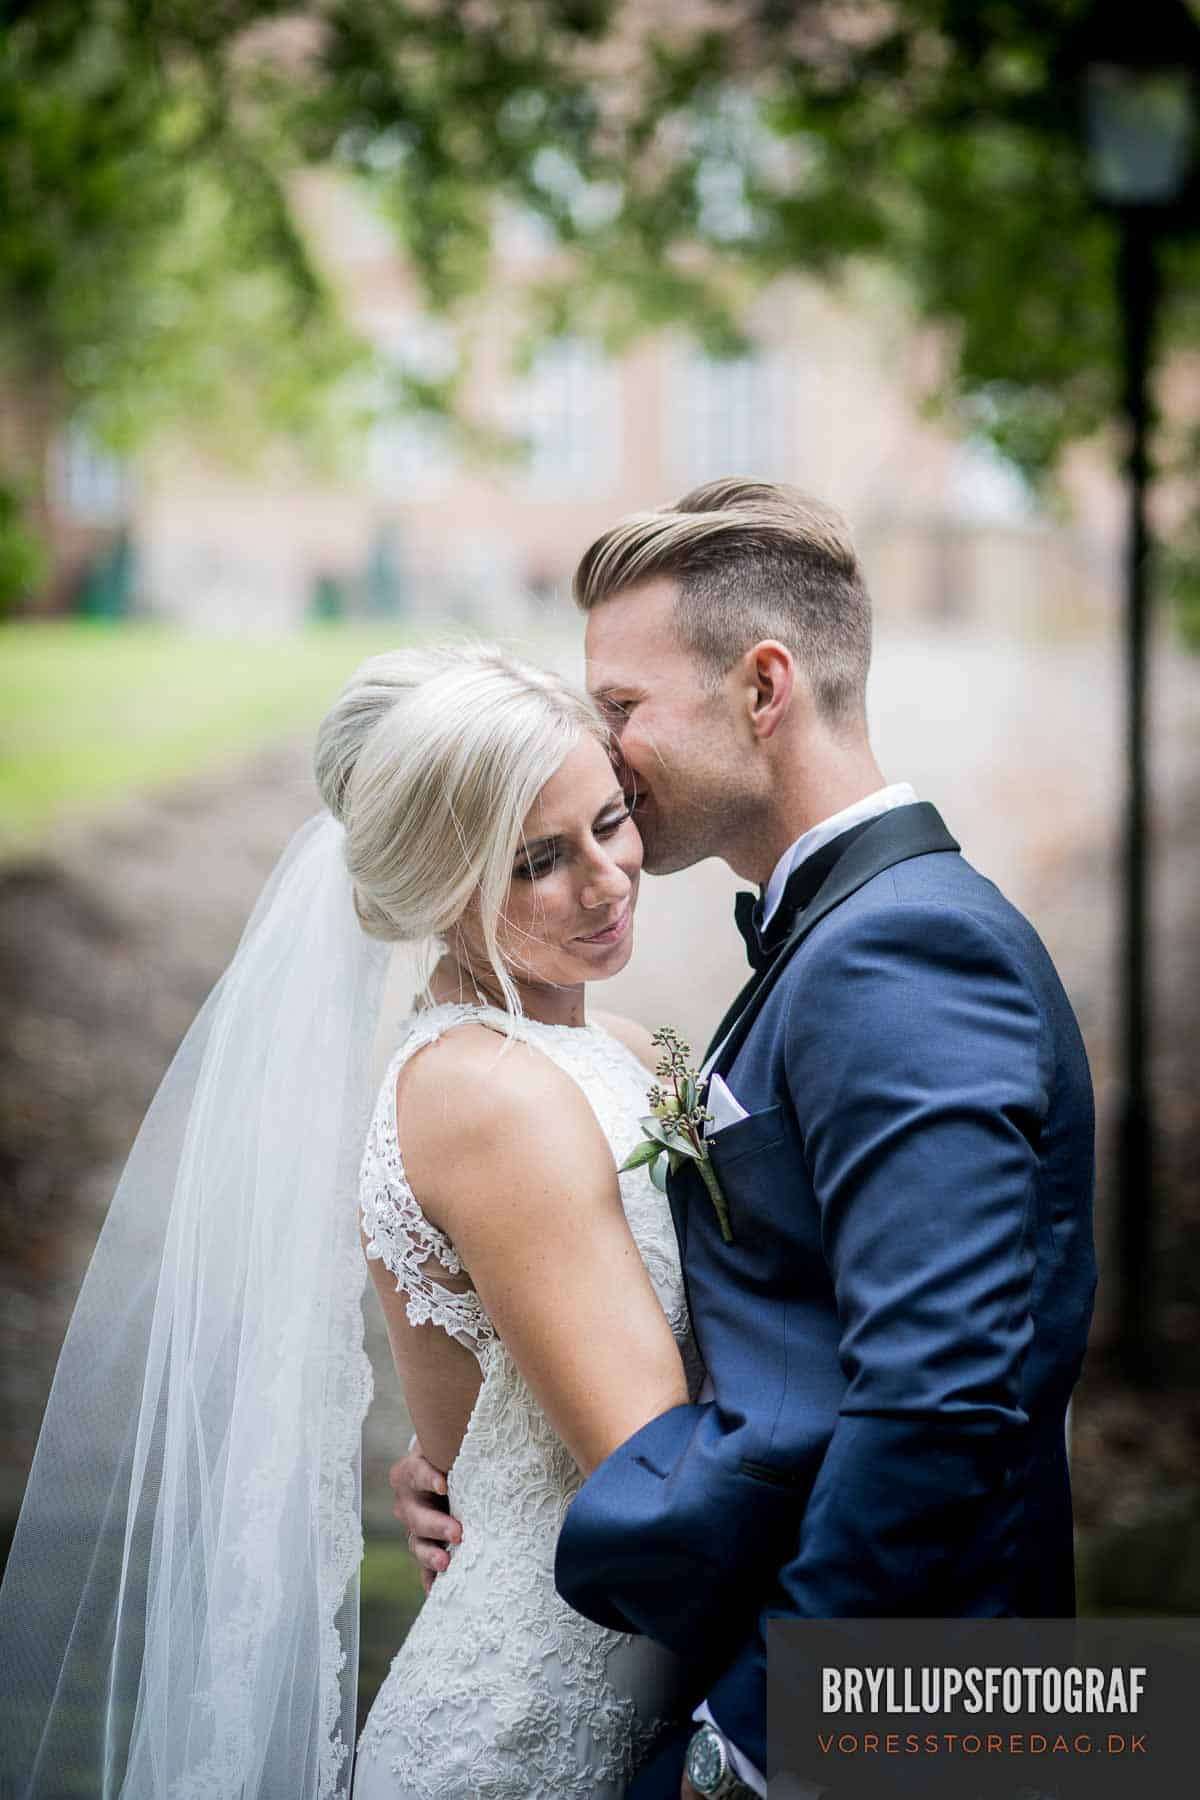 Holckenhavn Slotspark og bryllupsportrætter